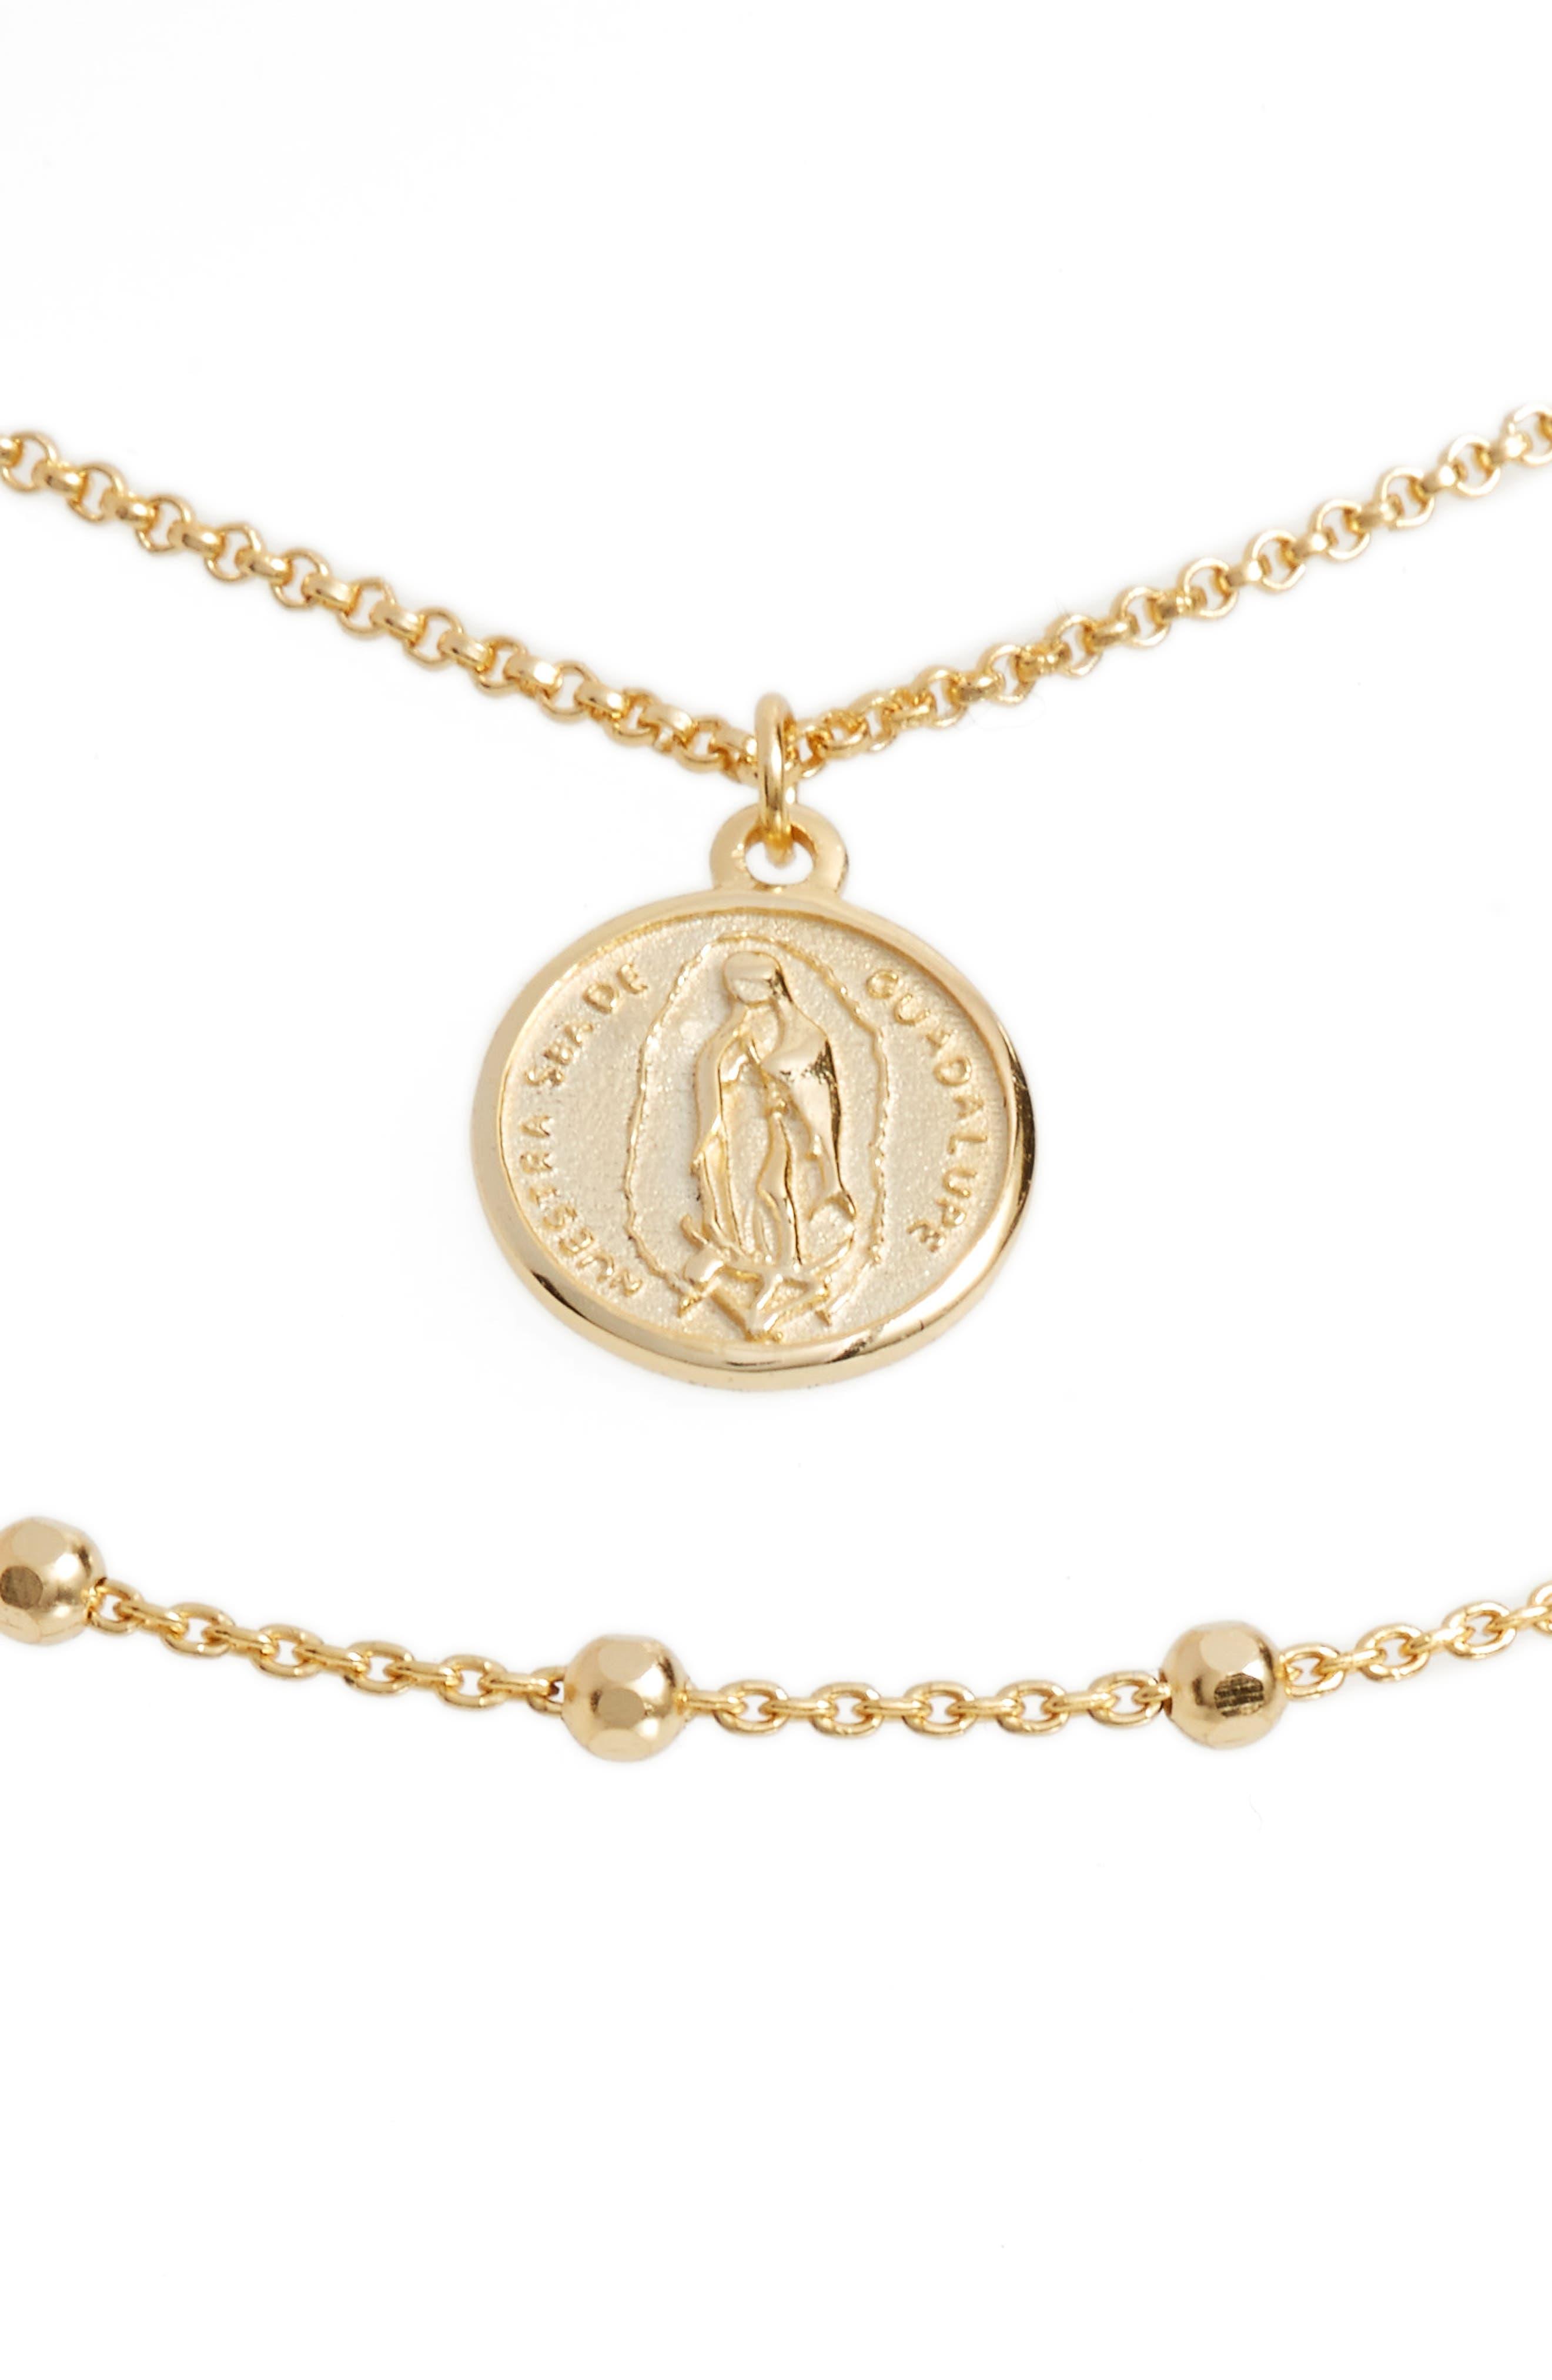 Women's Argento Vivo Guadalupe Multistrand Necklace